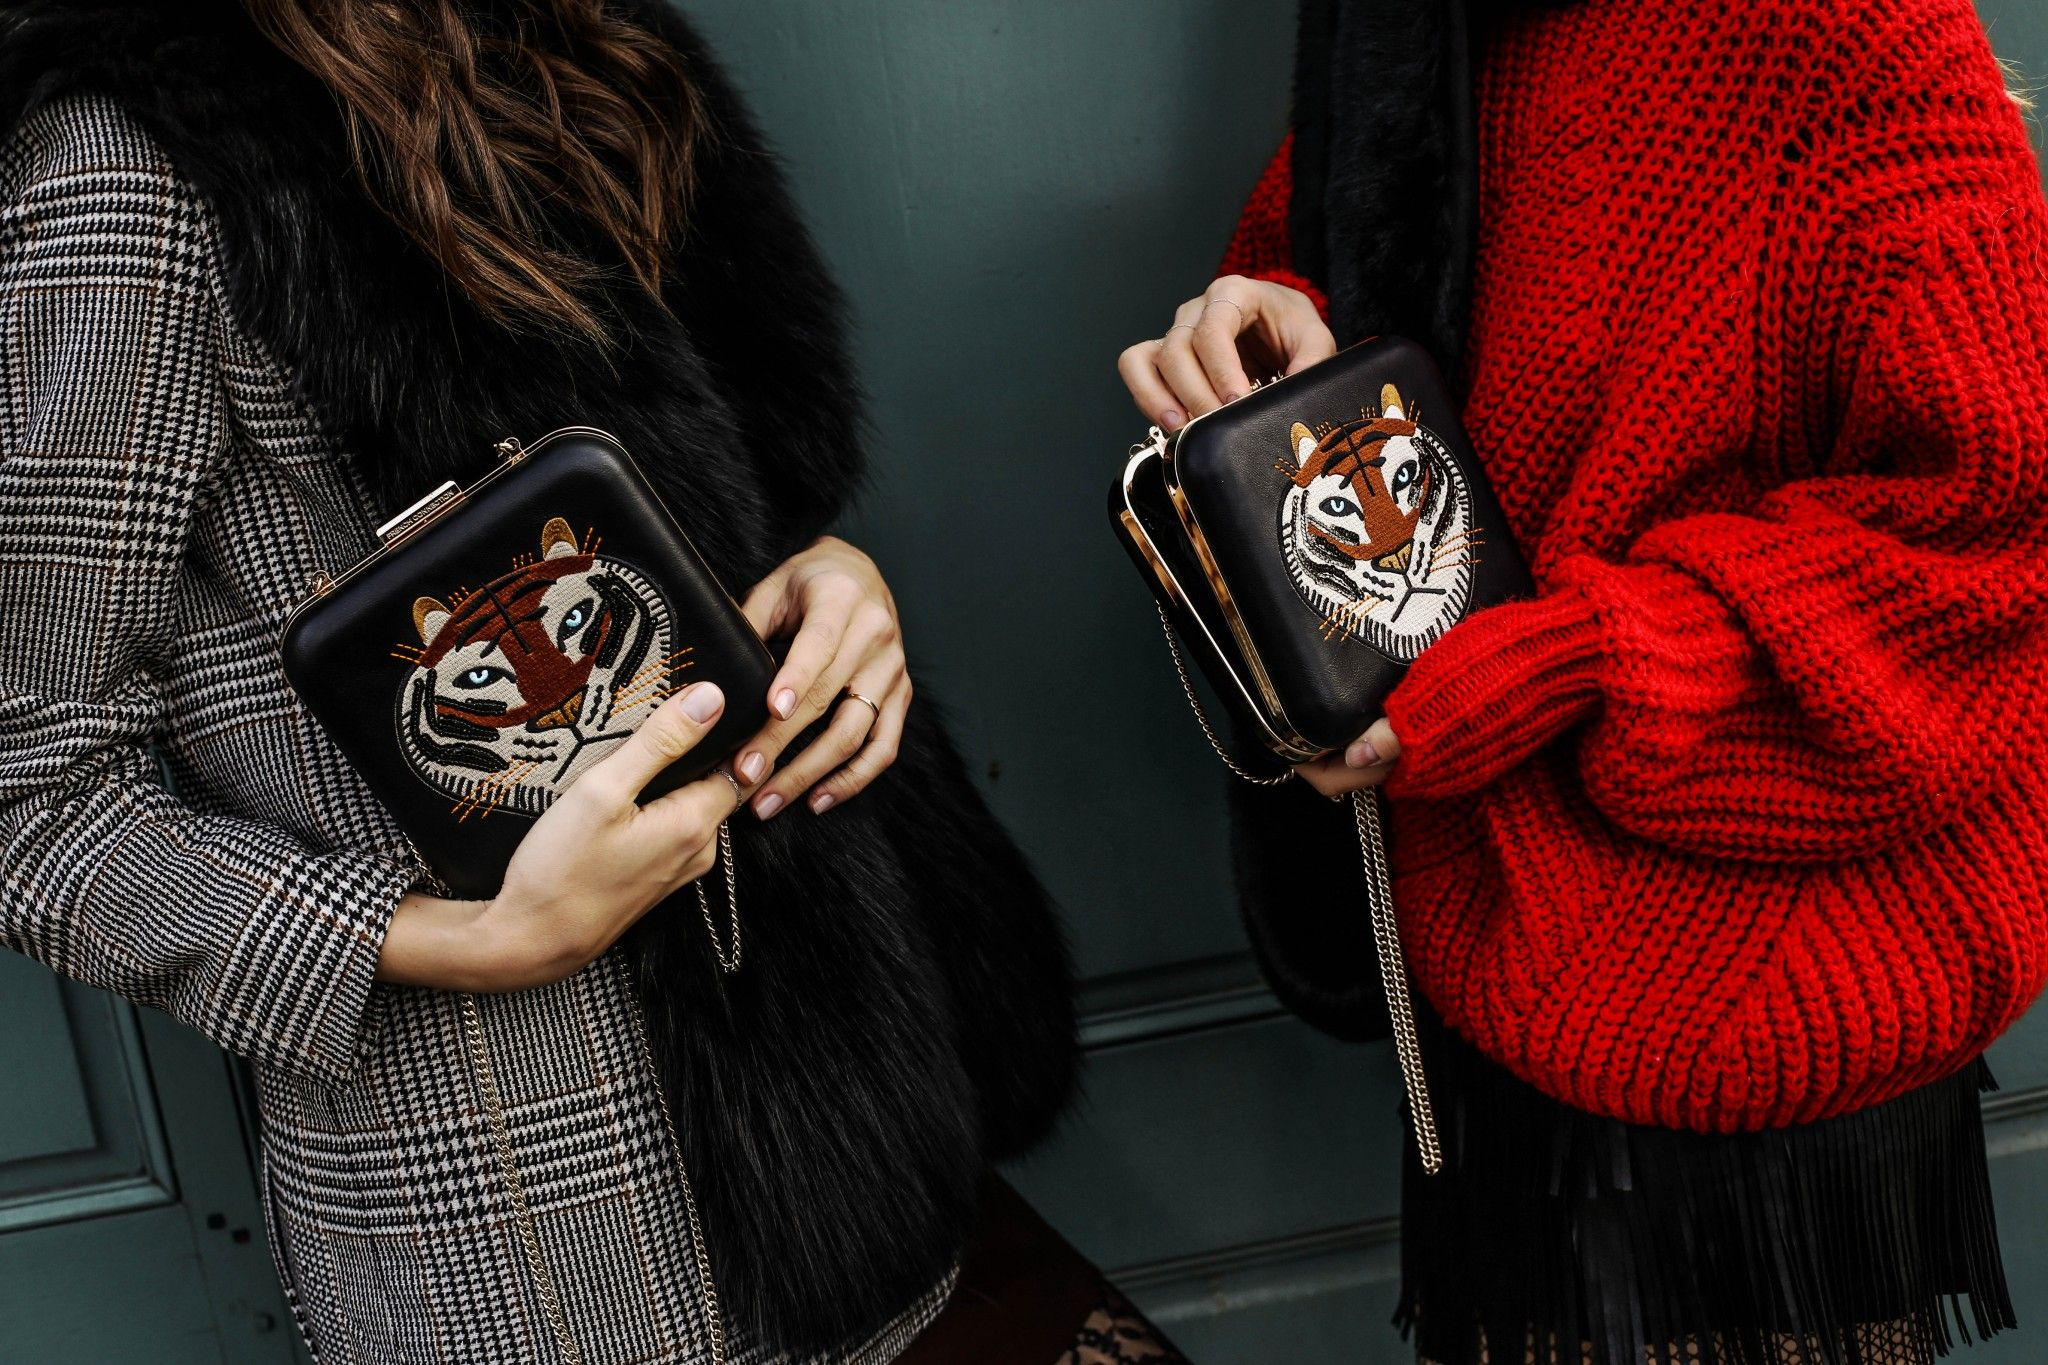 4black_friday_fabulous-muses_bibloo_winter_shopping